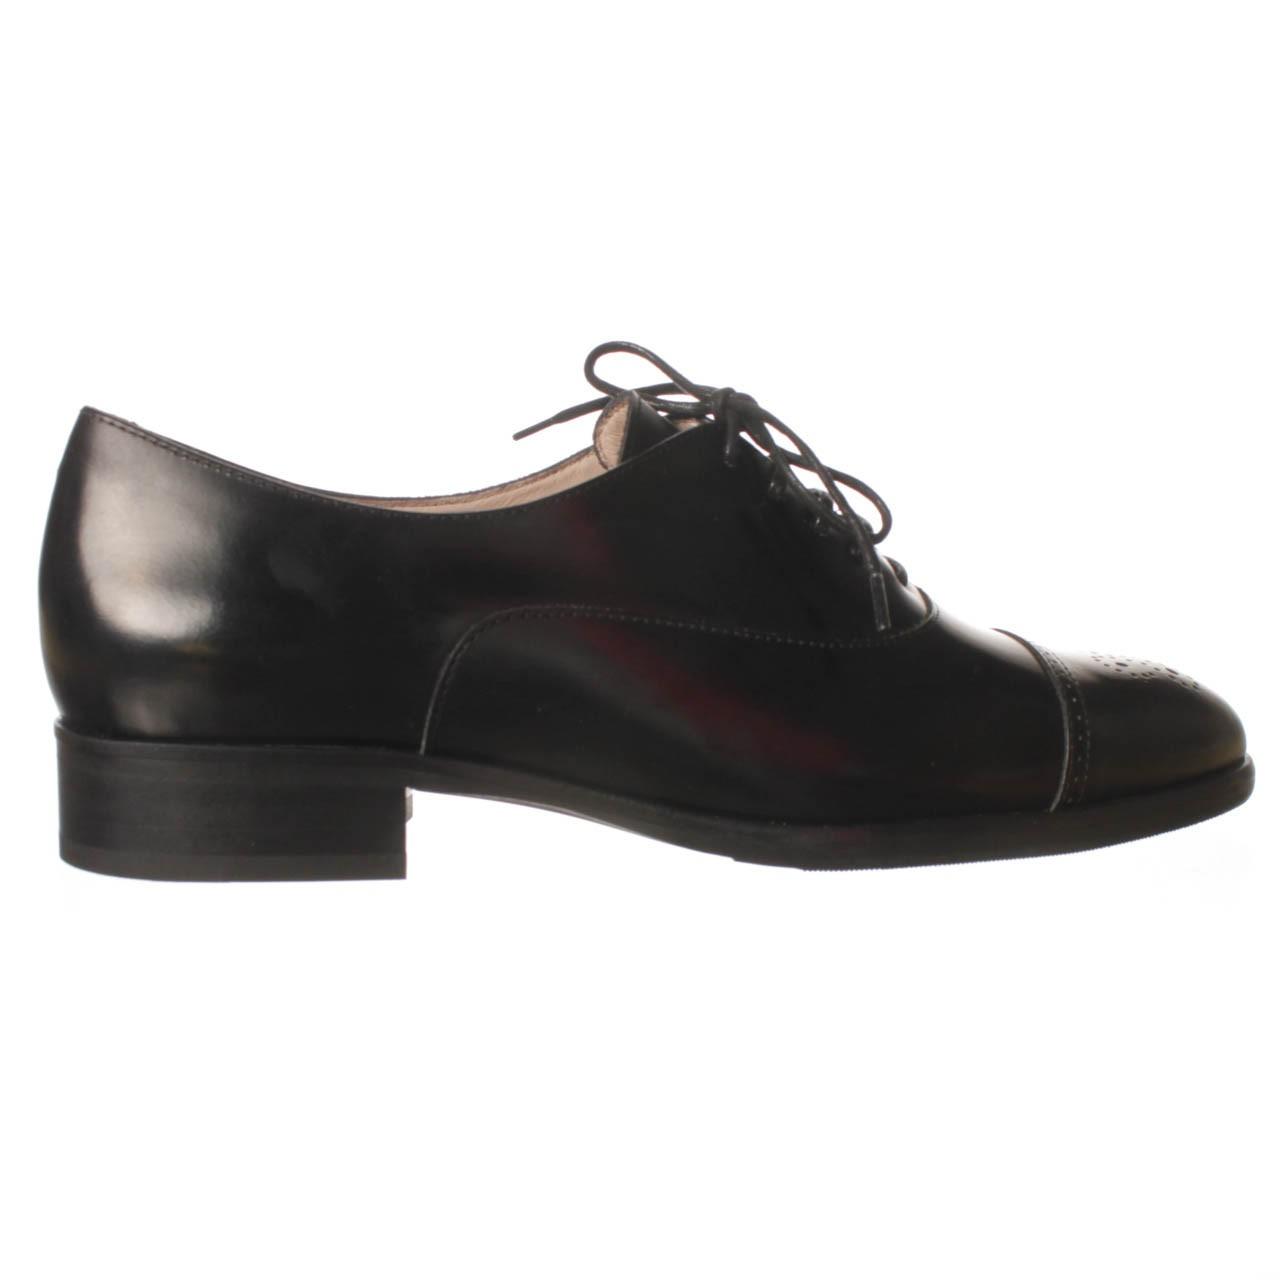 Hommes L.K. Bennett Piper Chaussures habillées 2NveqE